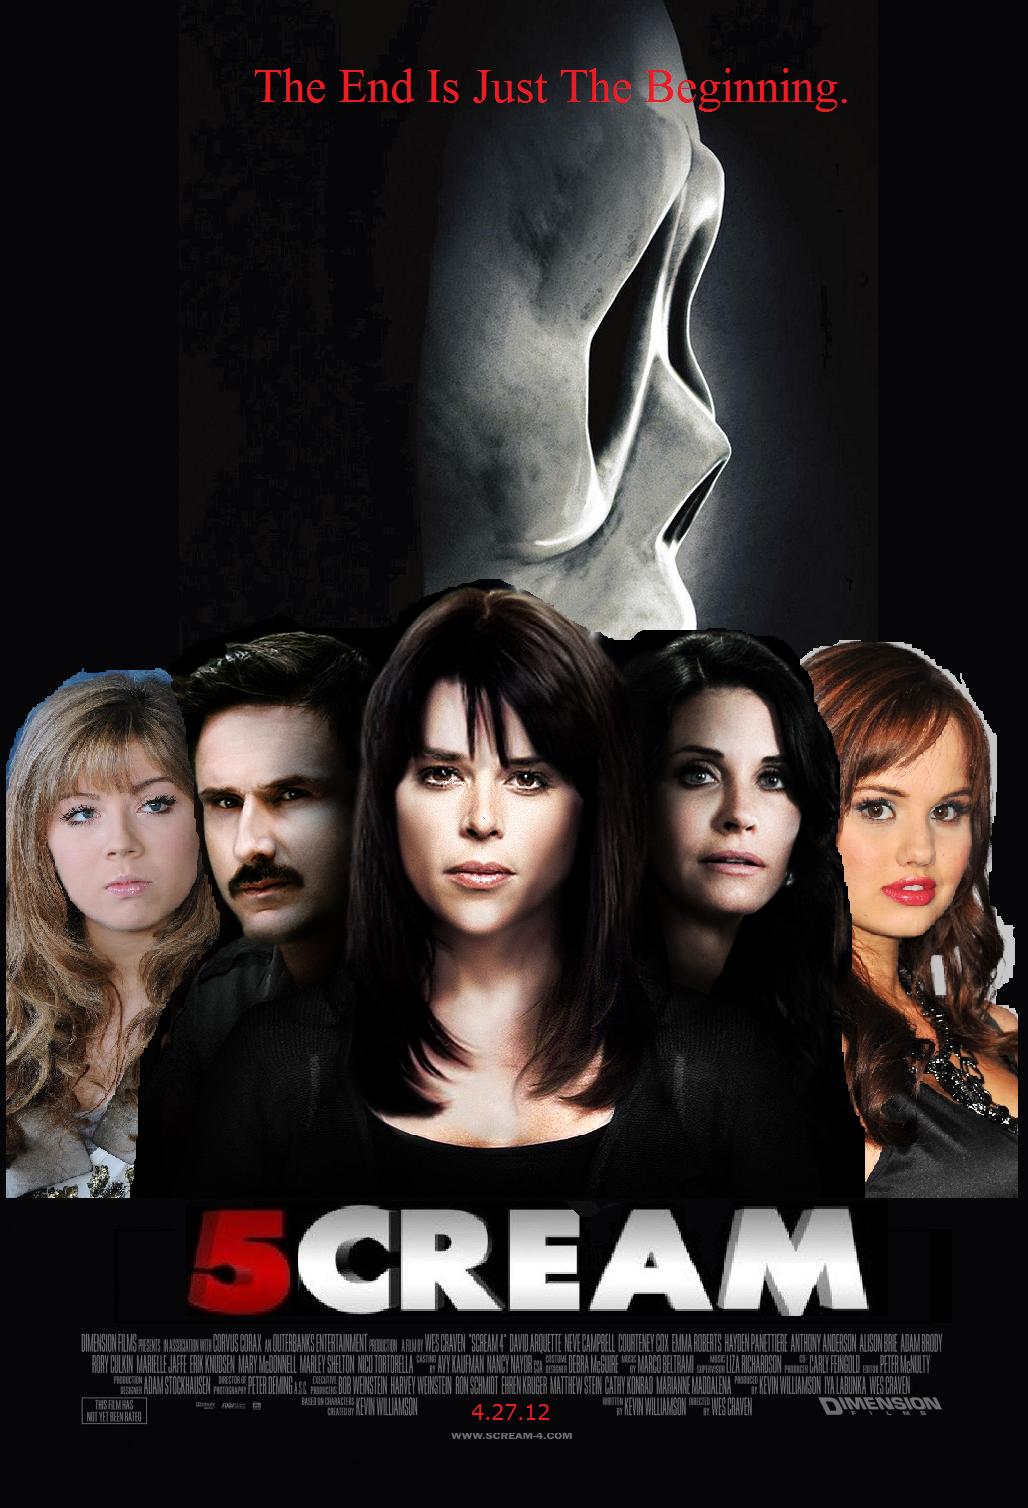 Talk:Scream 5 - Ceauntay Gorden's junkplace Wiki Ryan Phillippe Wiki